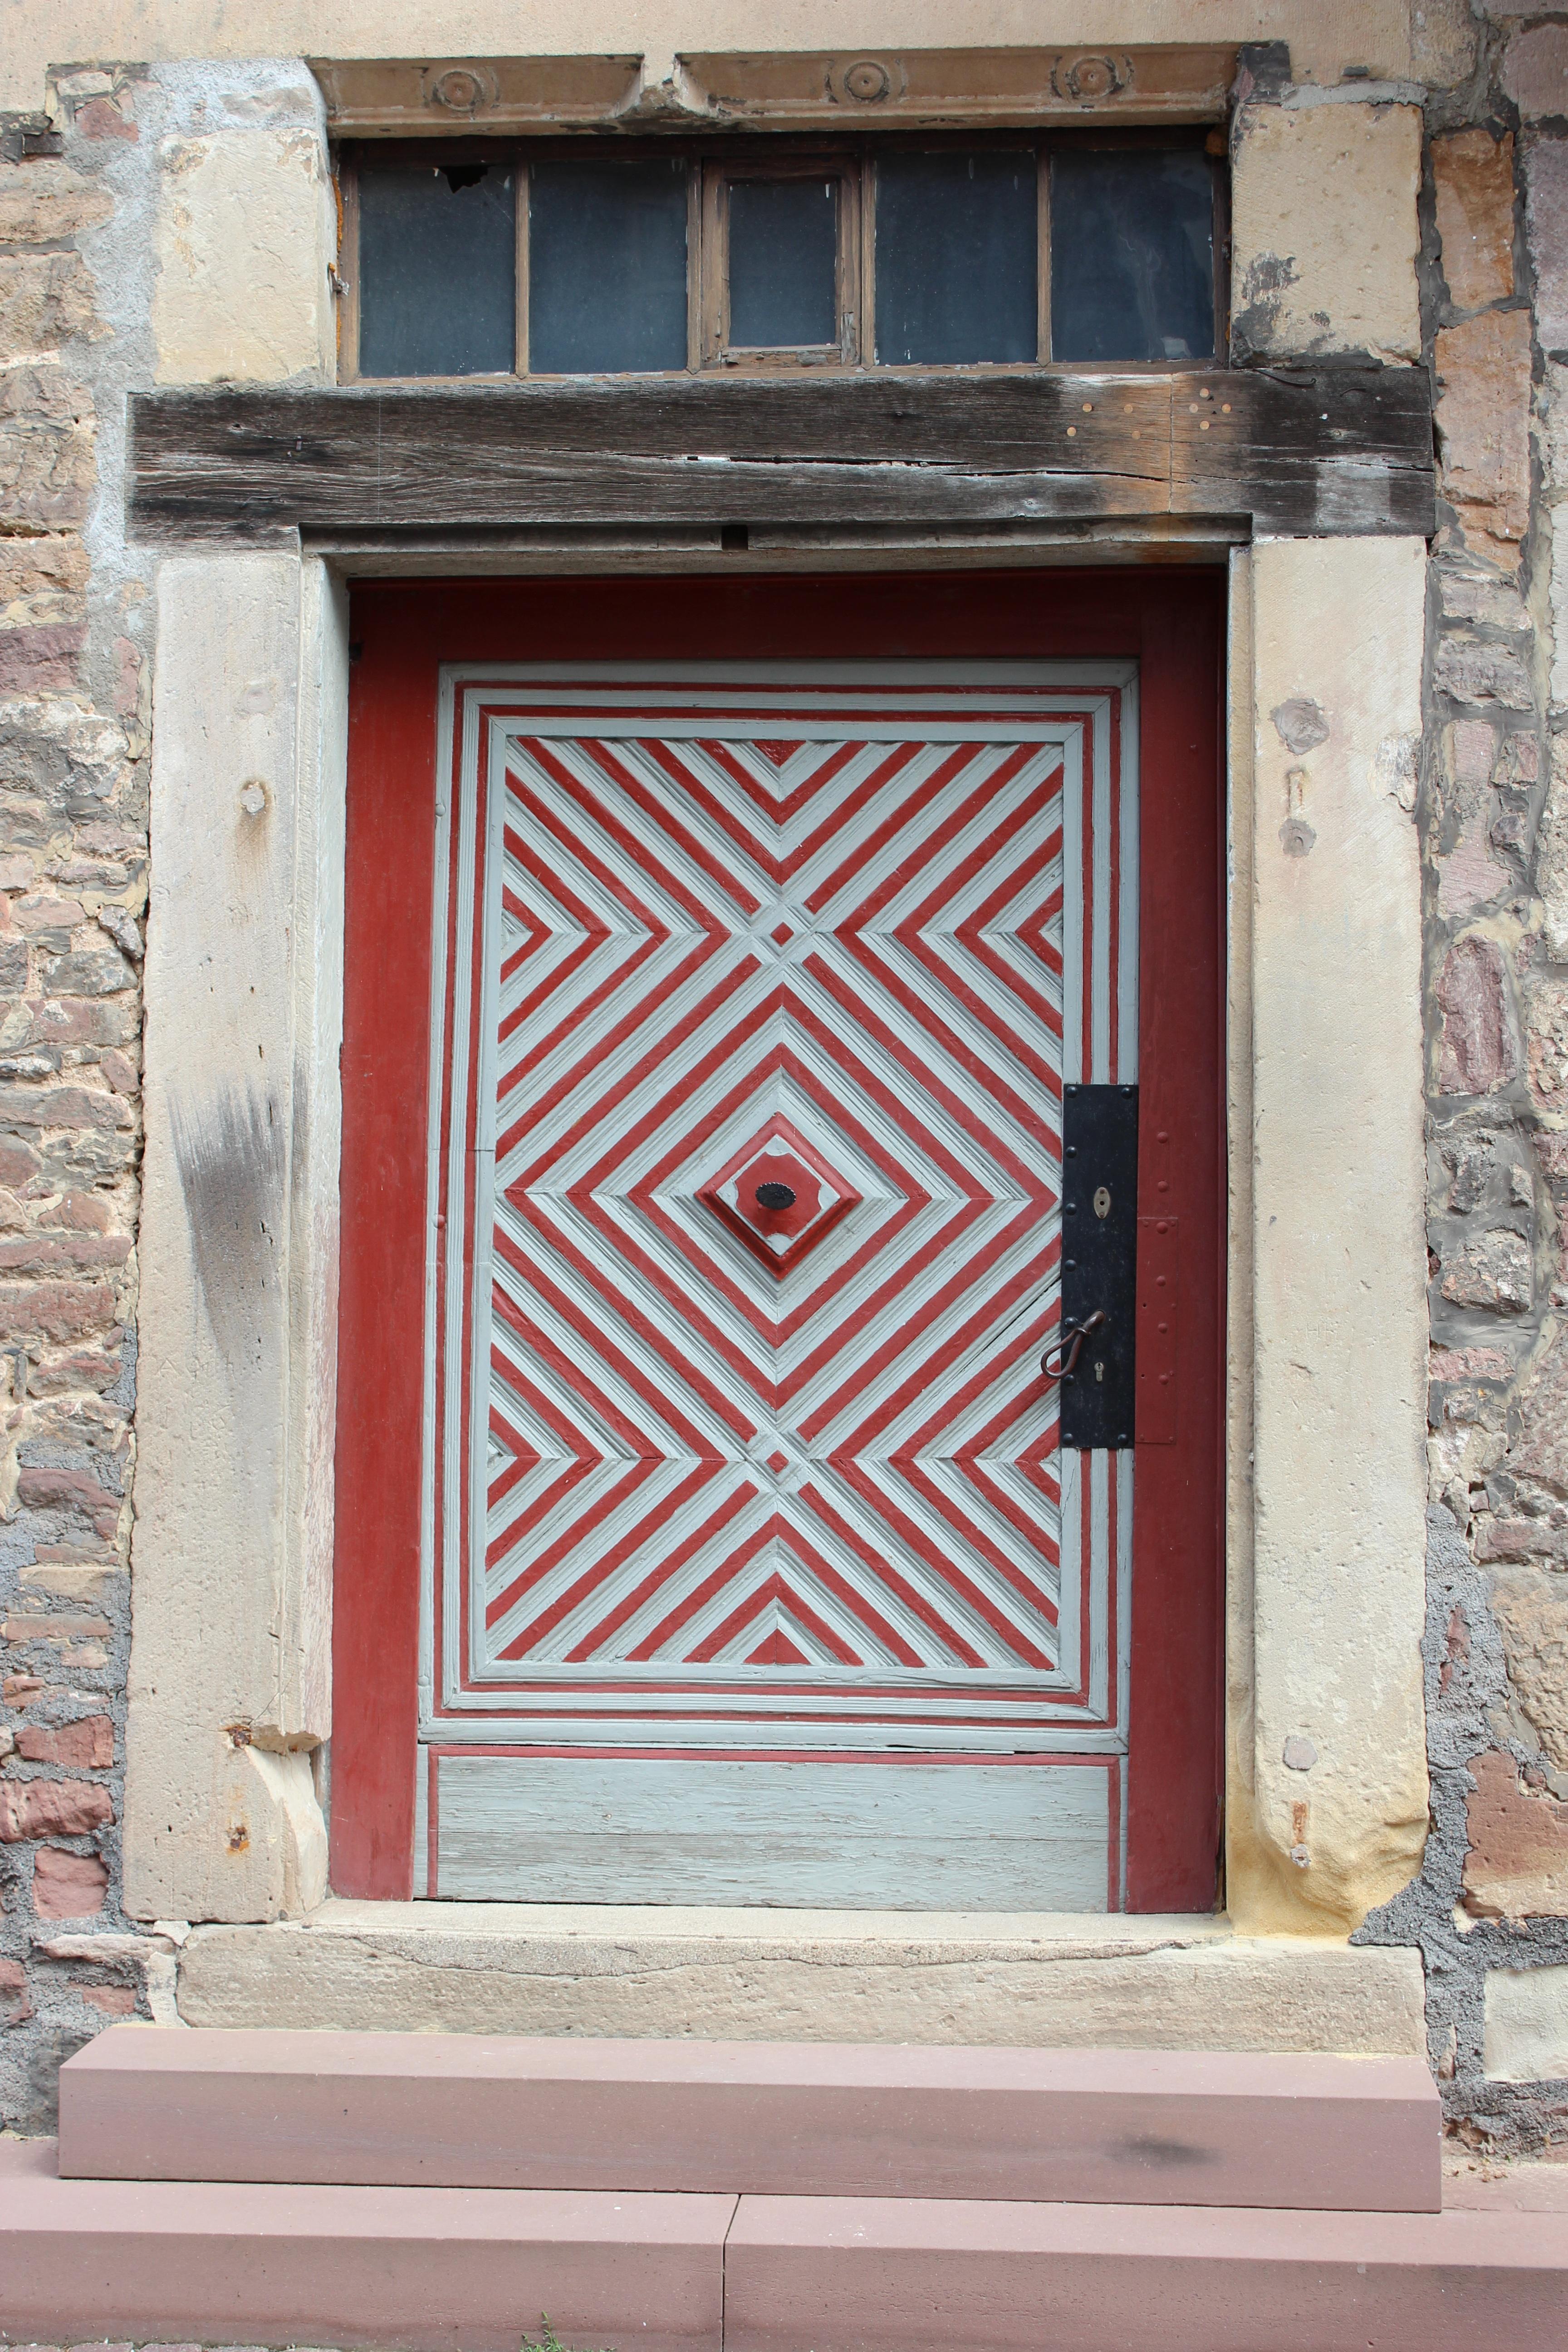 Fotos gratis : arquitectura, madera, ventana, antiguo, pared, patrón ...